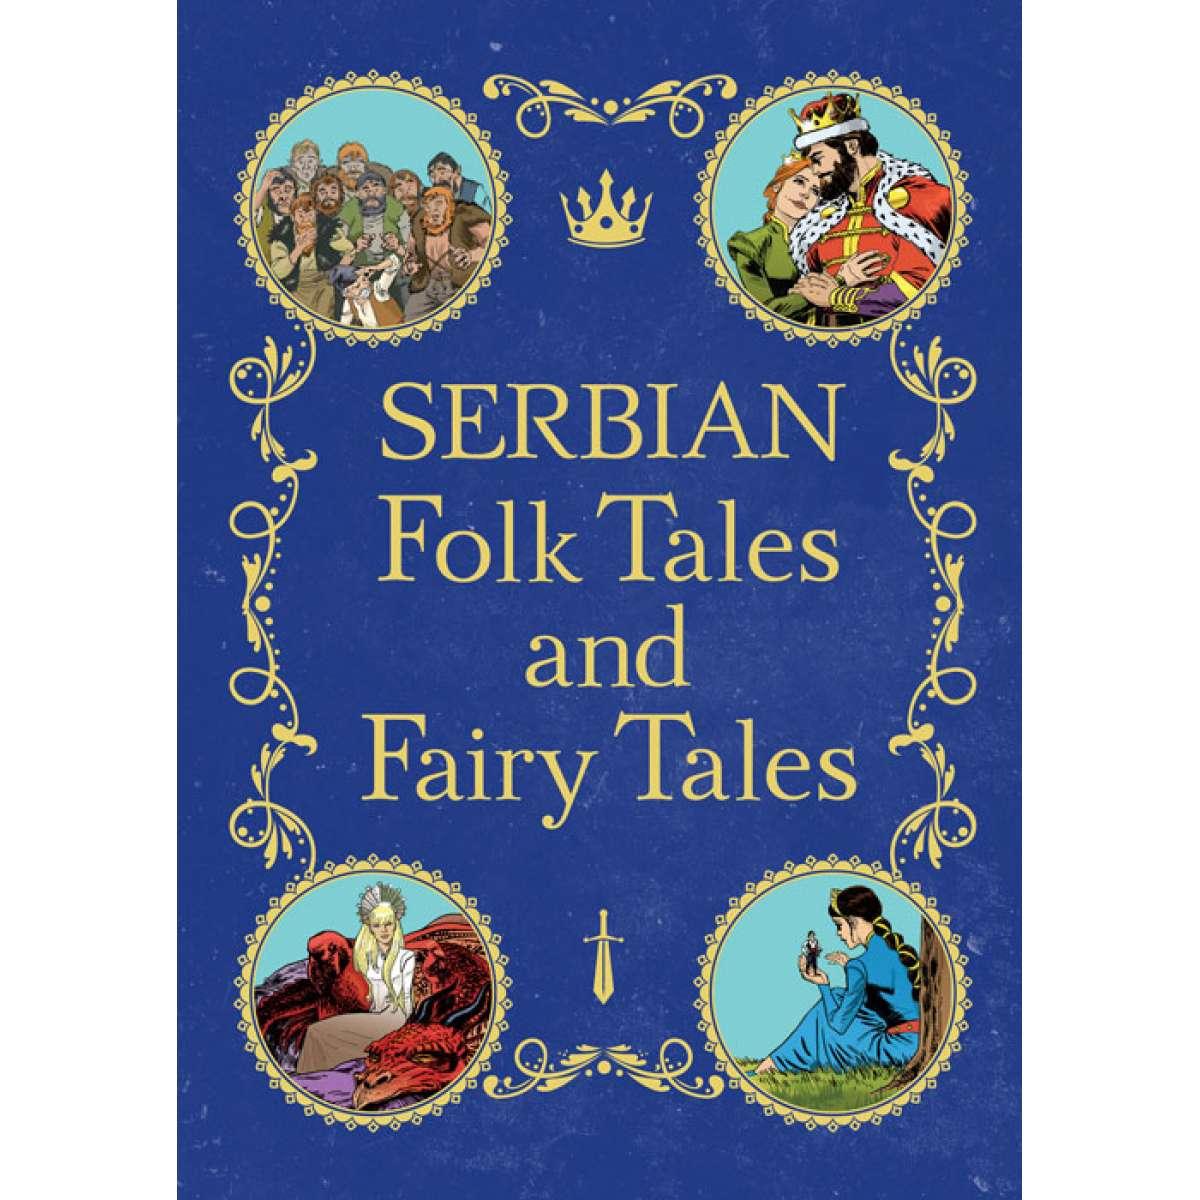 SERBIAN FOLK STORIES AND FAIRY-TALES